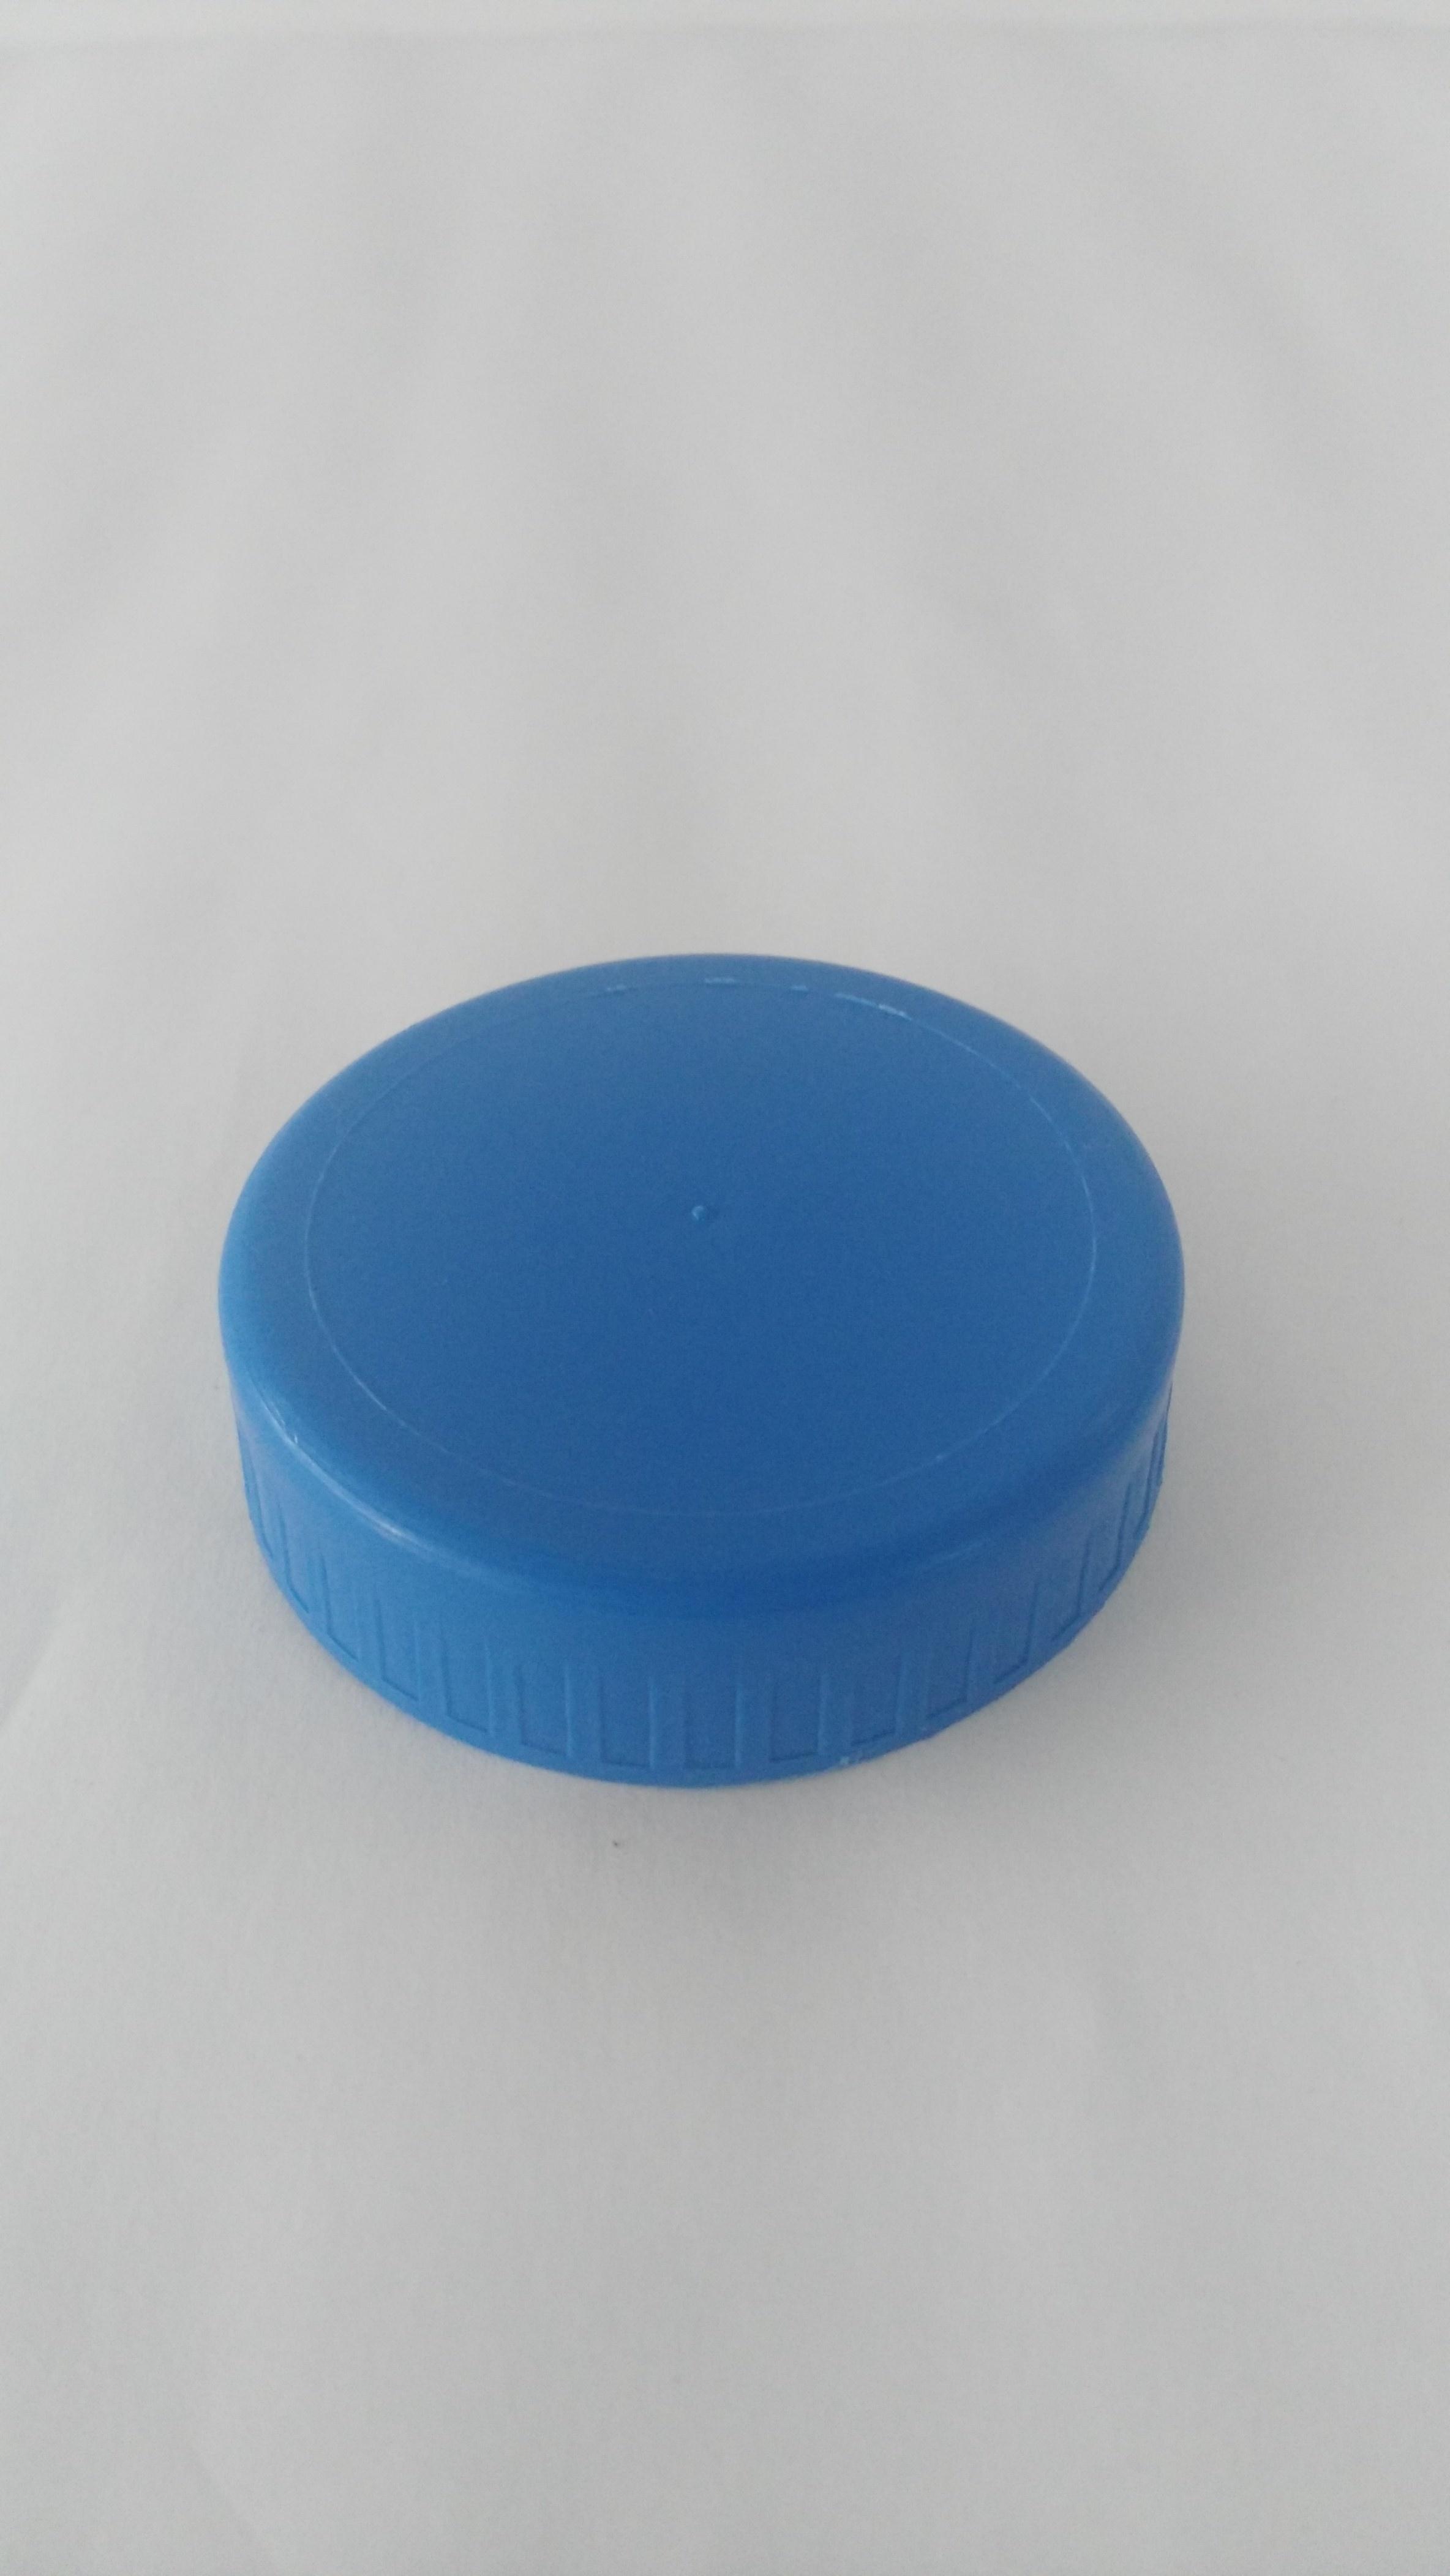 Tapa R-56 (electropura) generica